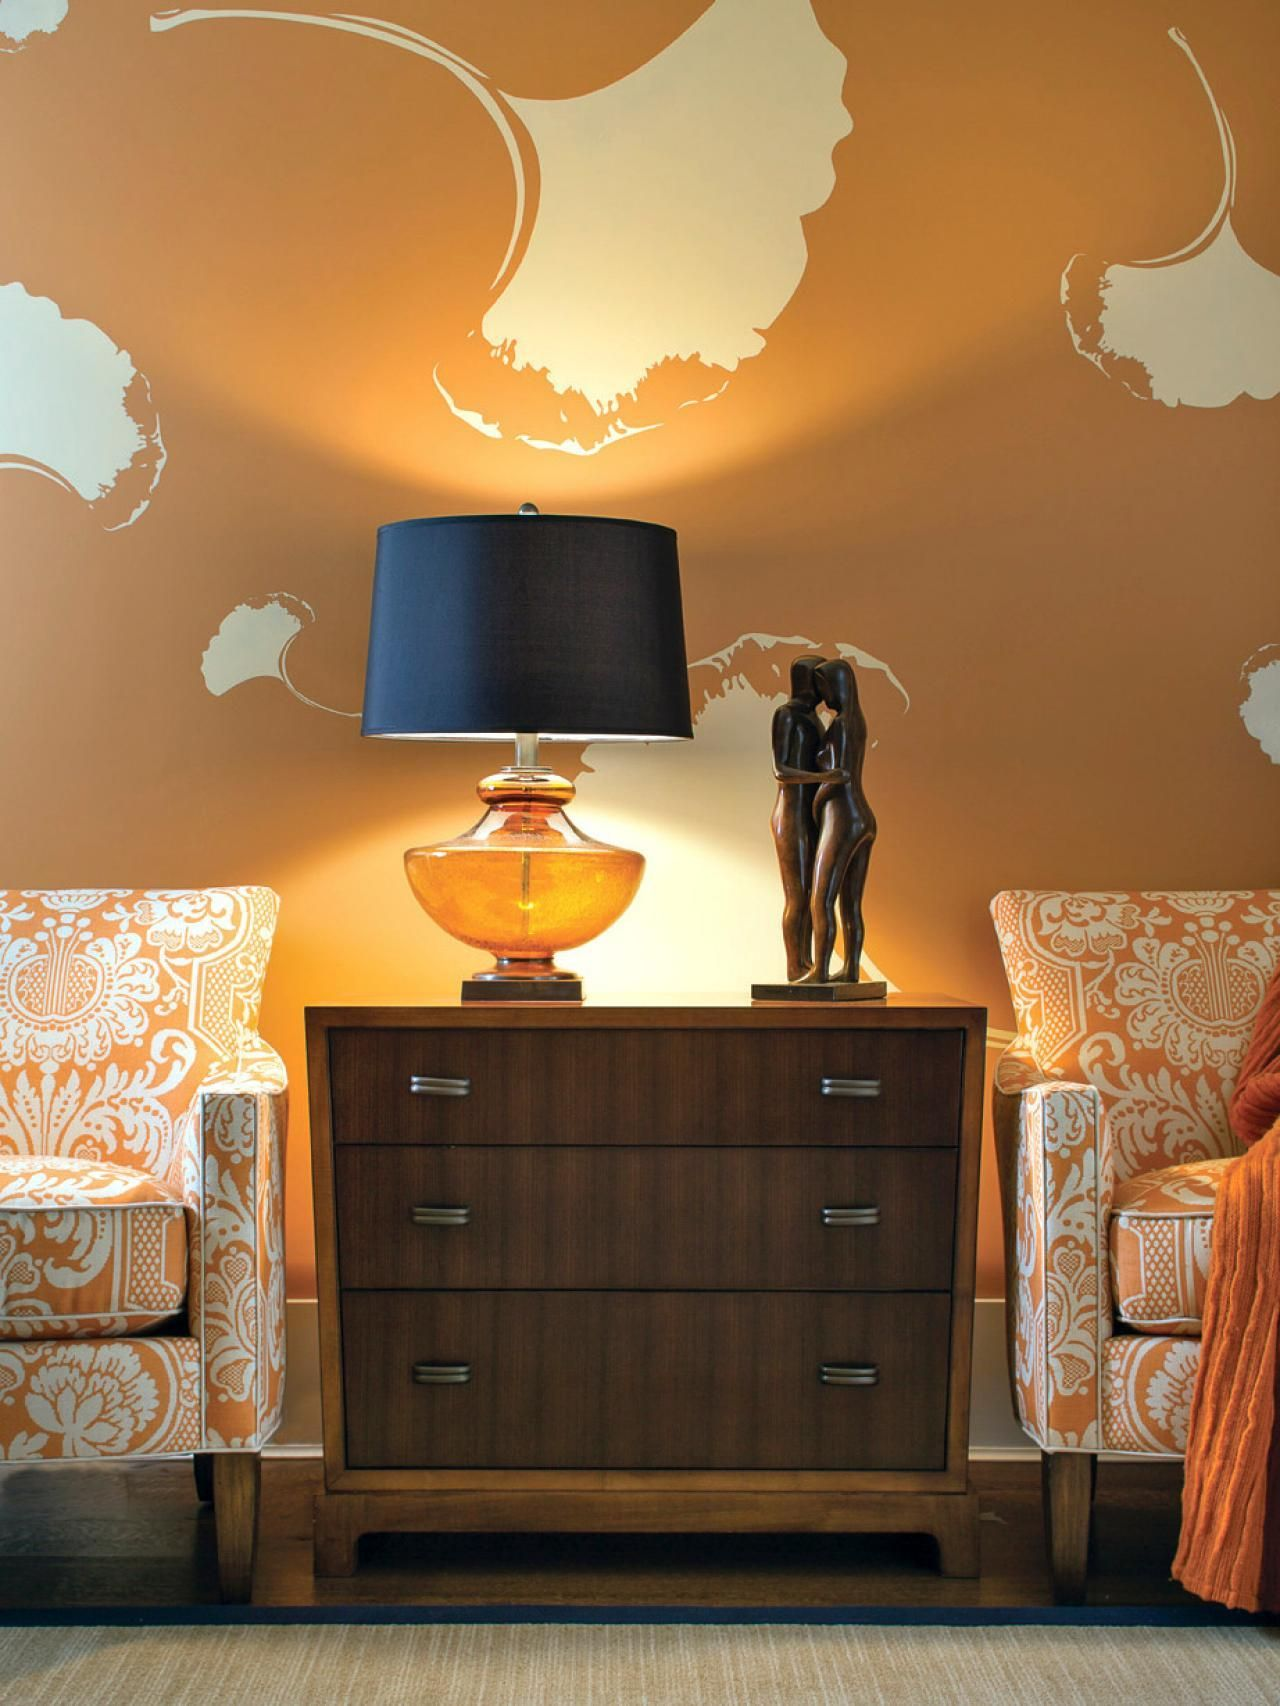 Pumpkin Spice Paint Living Room Pumpkin Spice Paint Living Room 25 Wall Color Ideas Benjamin